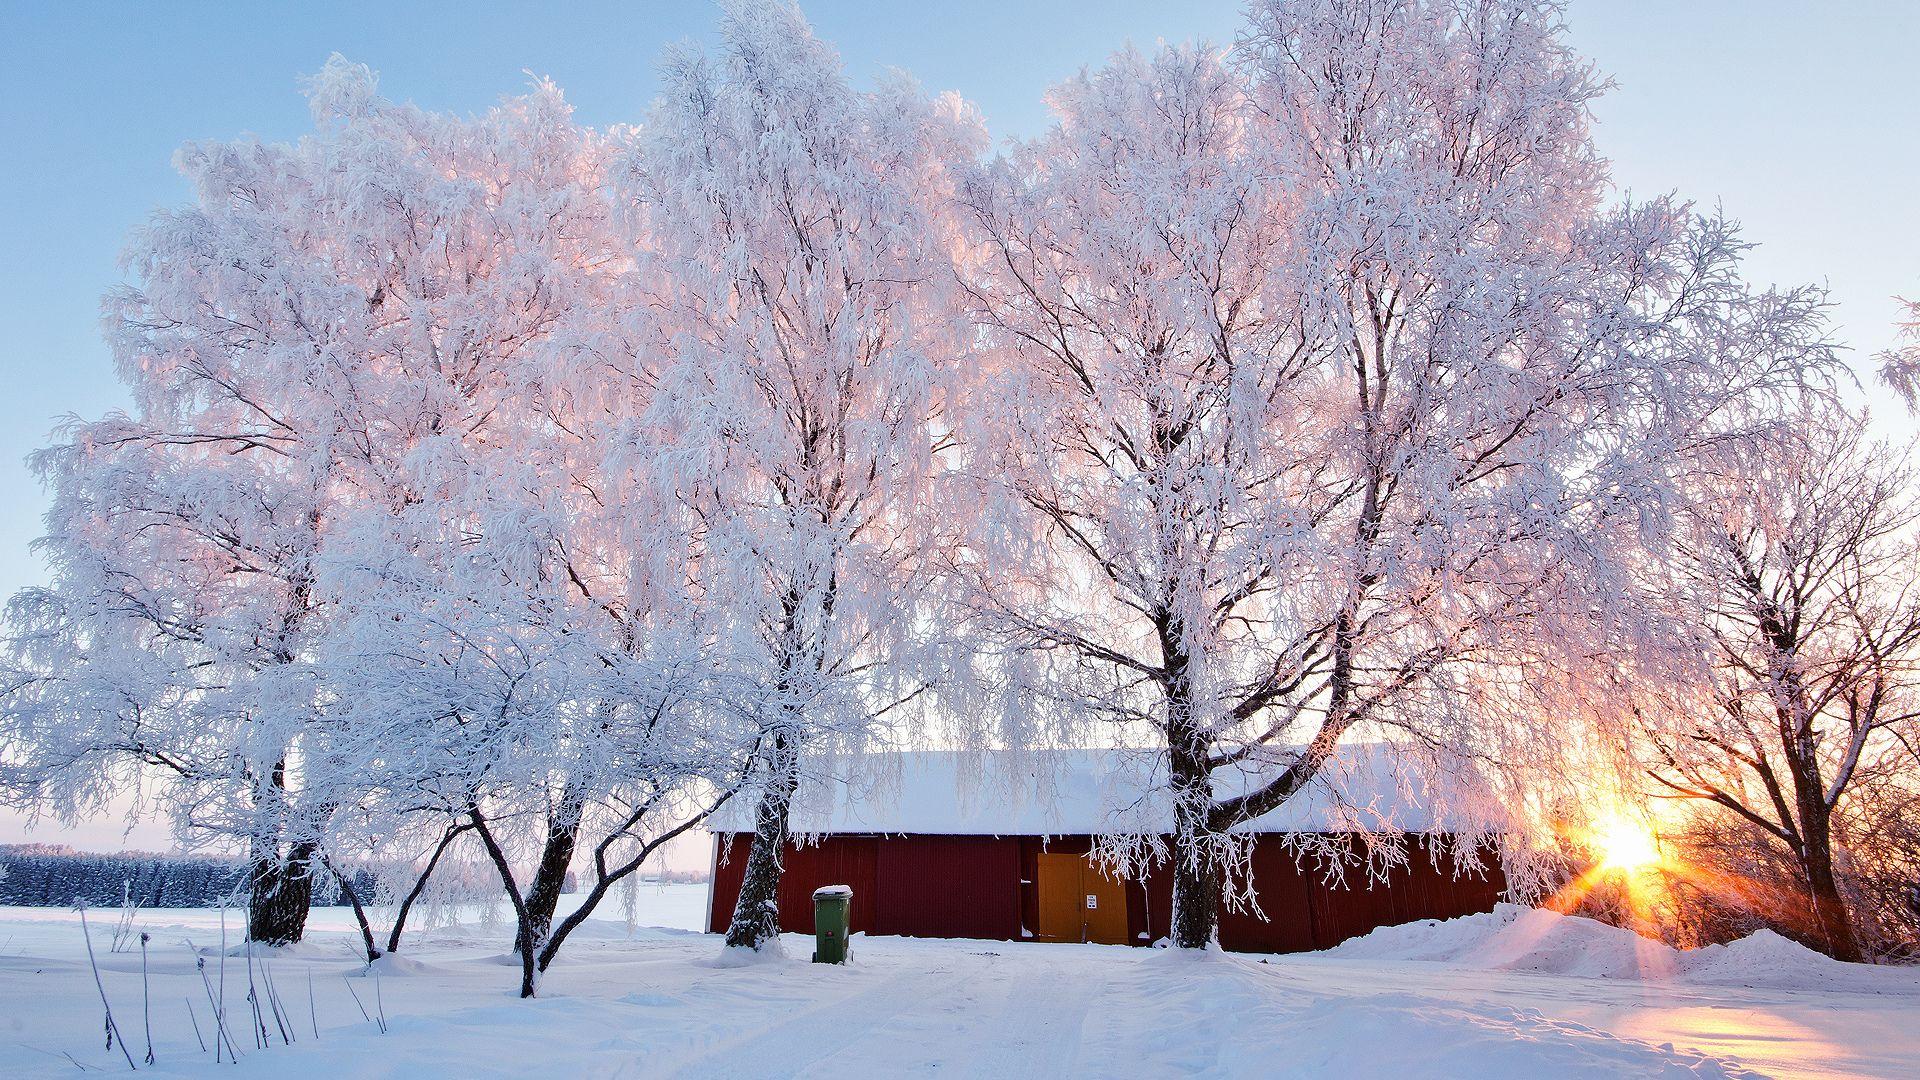 Sunny Winter Day Photo